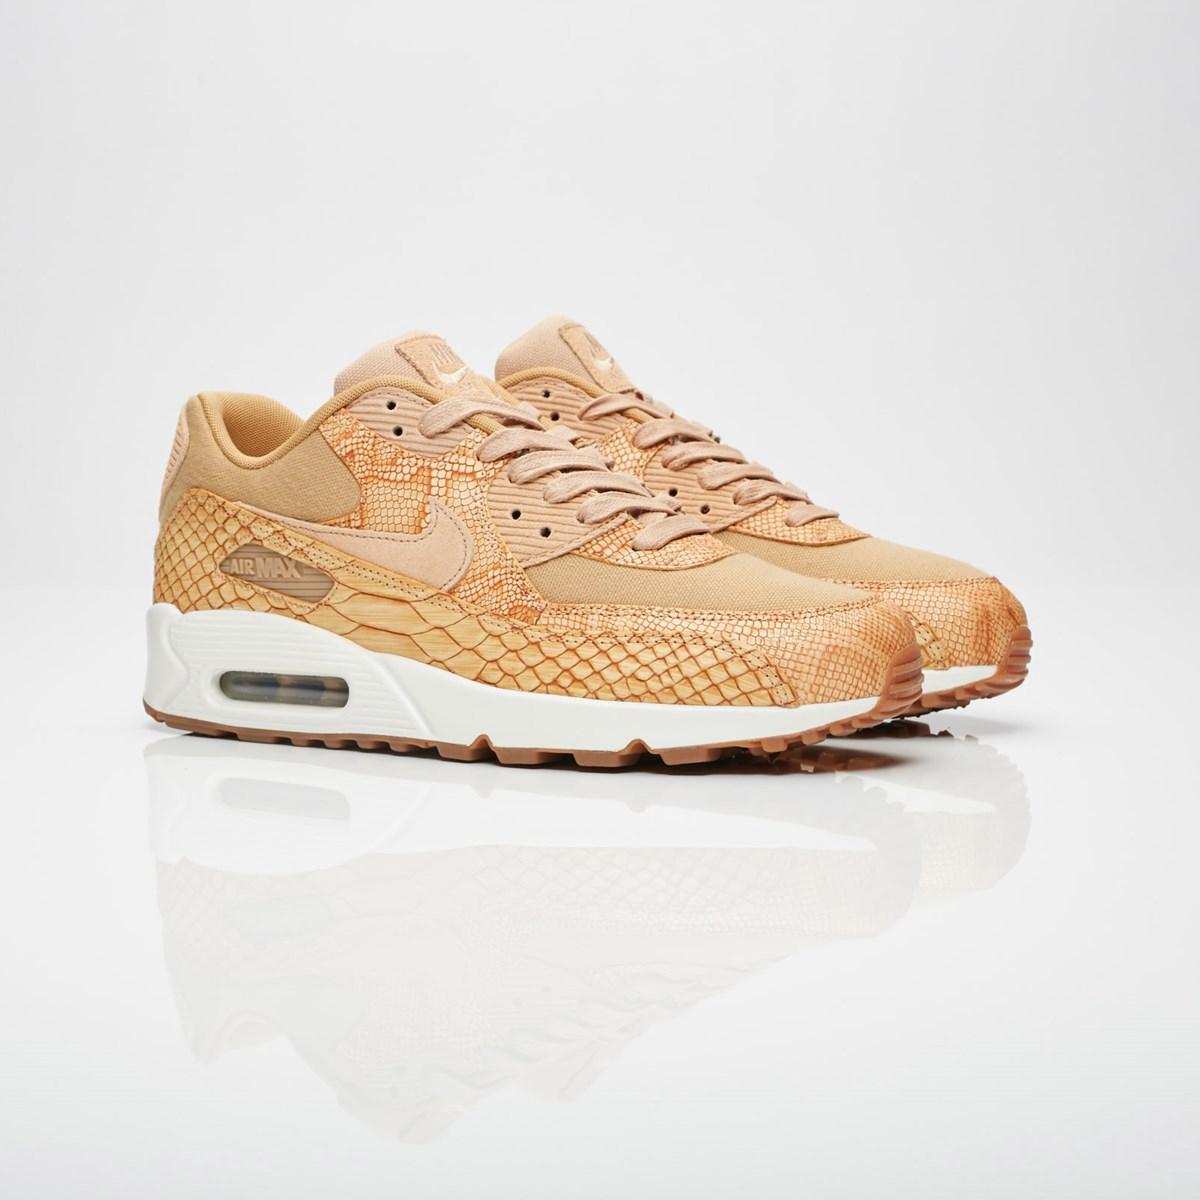 size 40 f44cf 01821 nike air max 90 premium ltr ah8046 200 sneakers   streetwear på nätet sen  1999